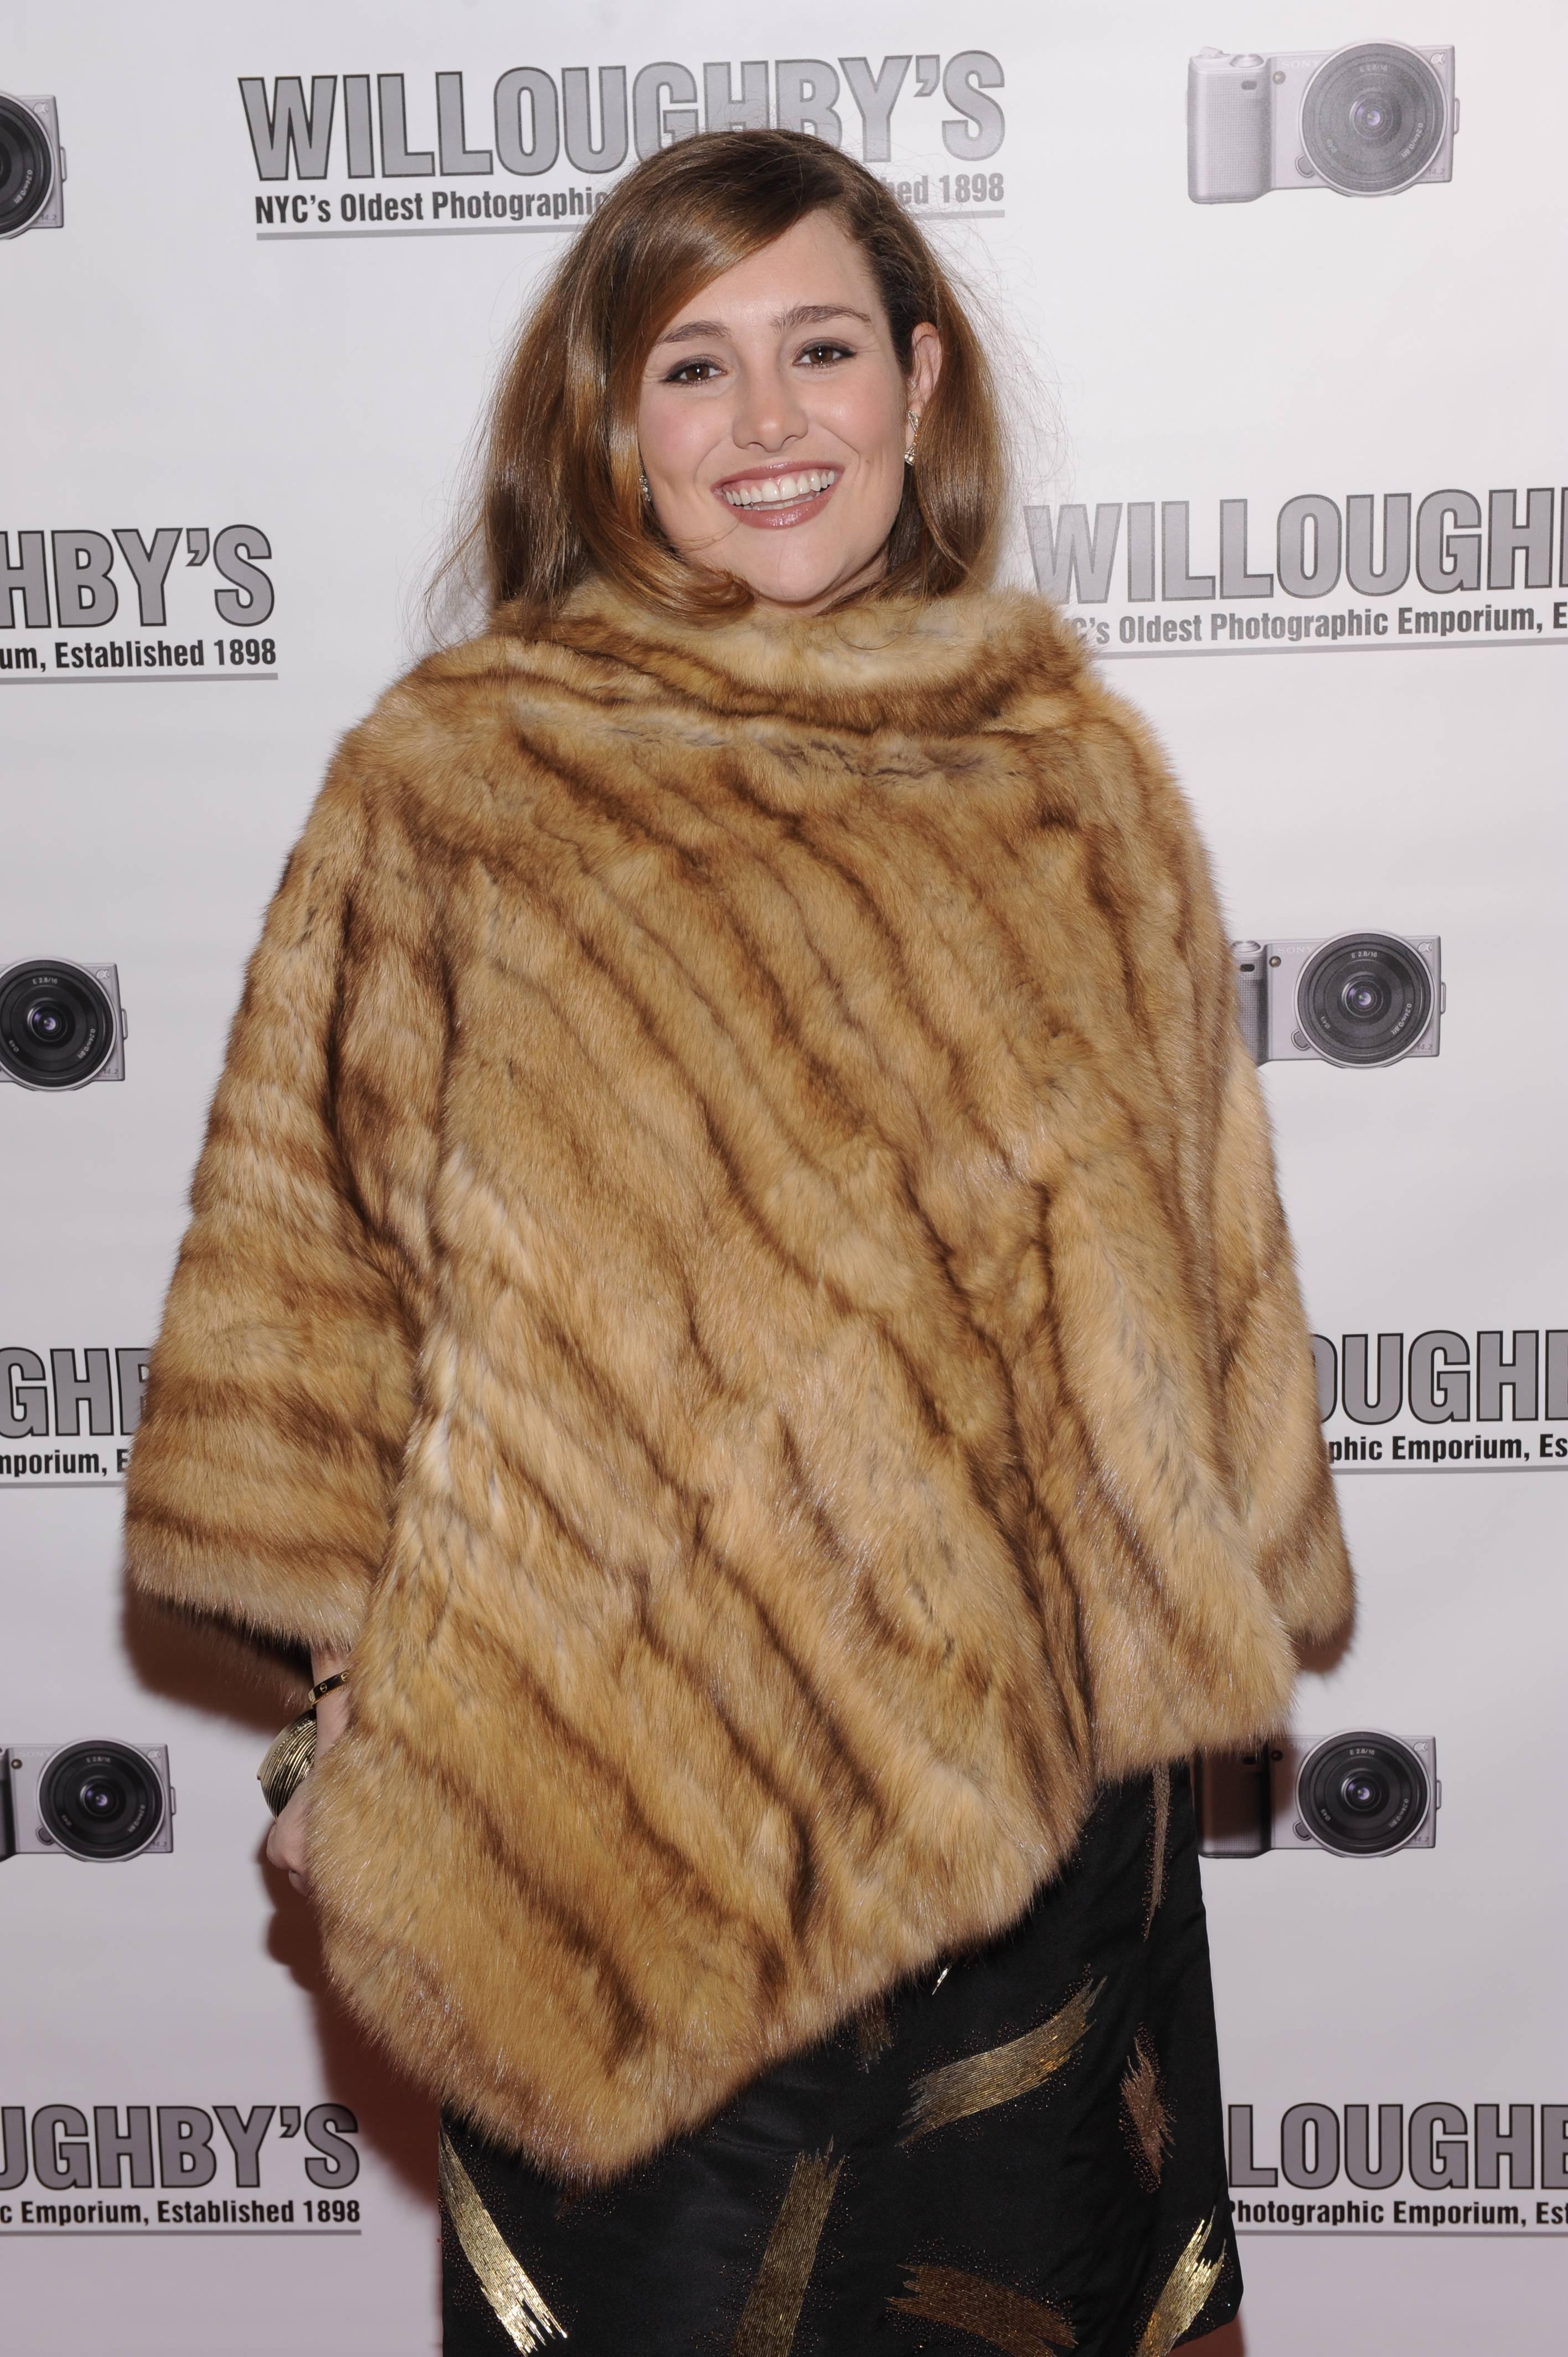 Gillian Hearst Simonds